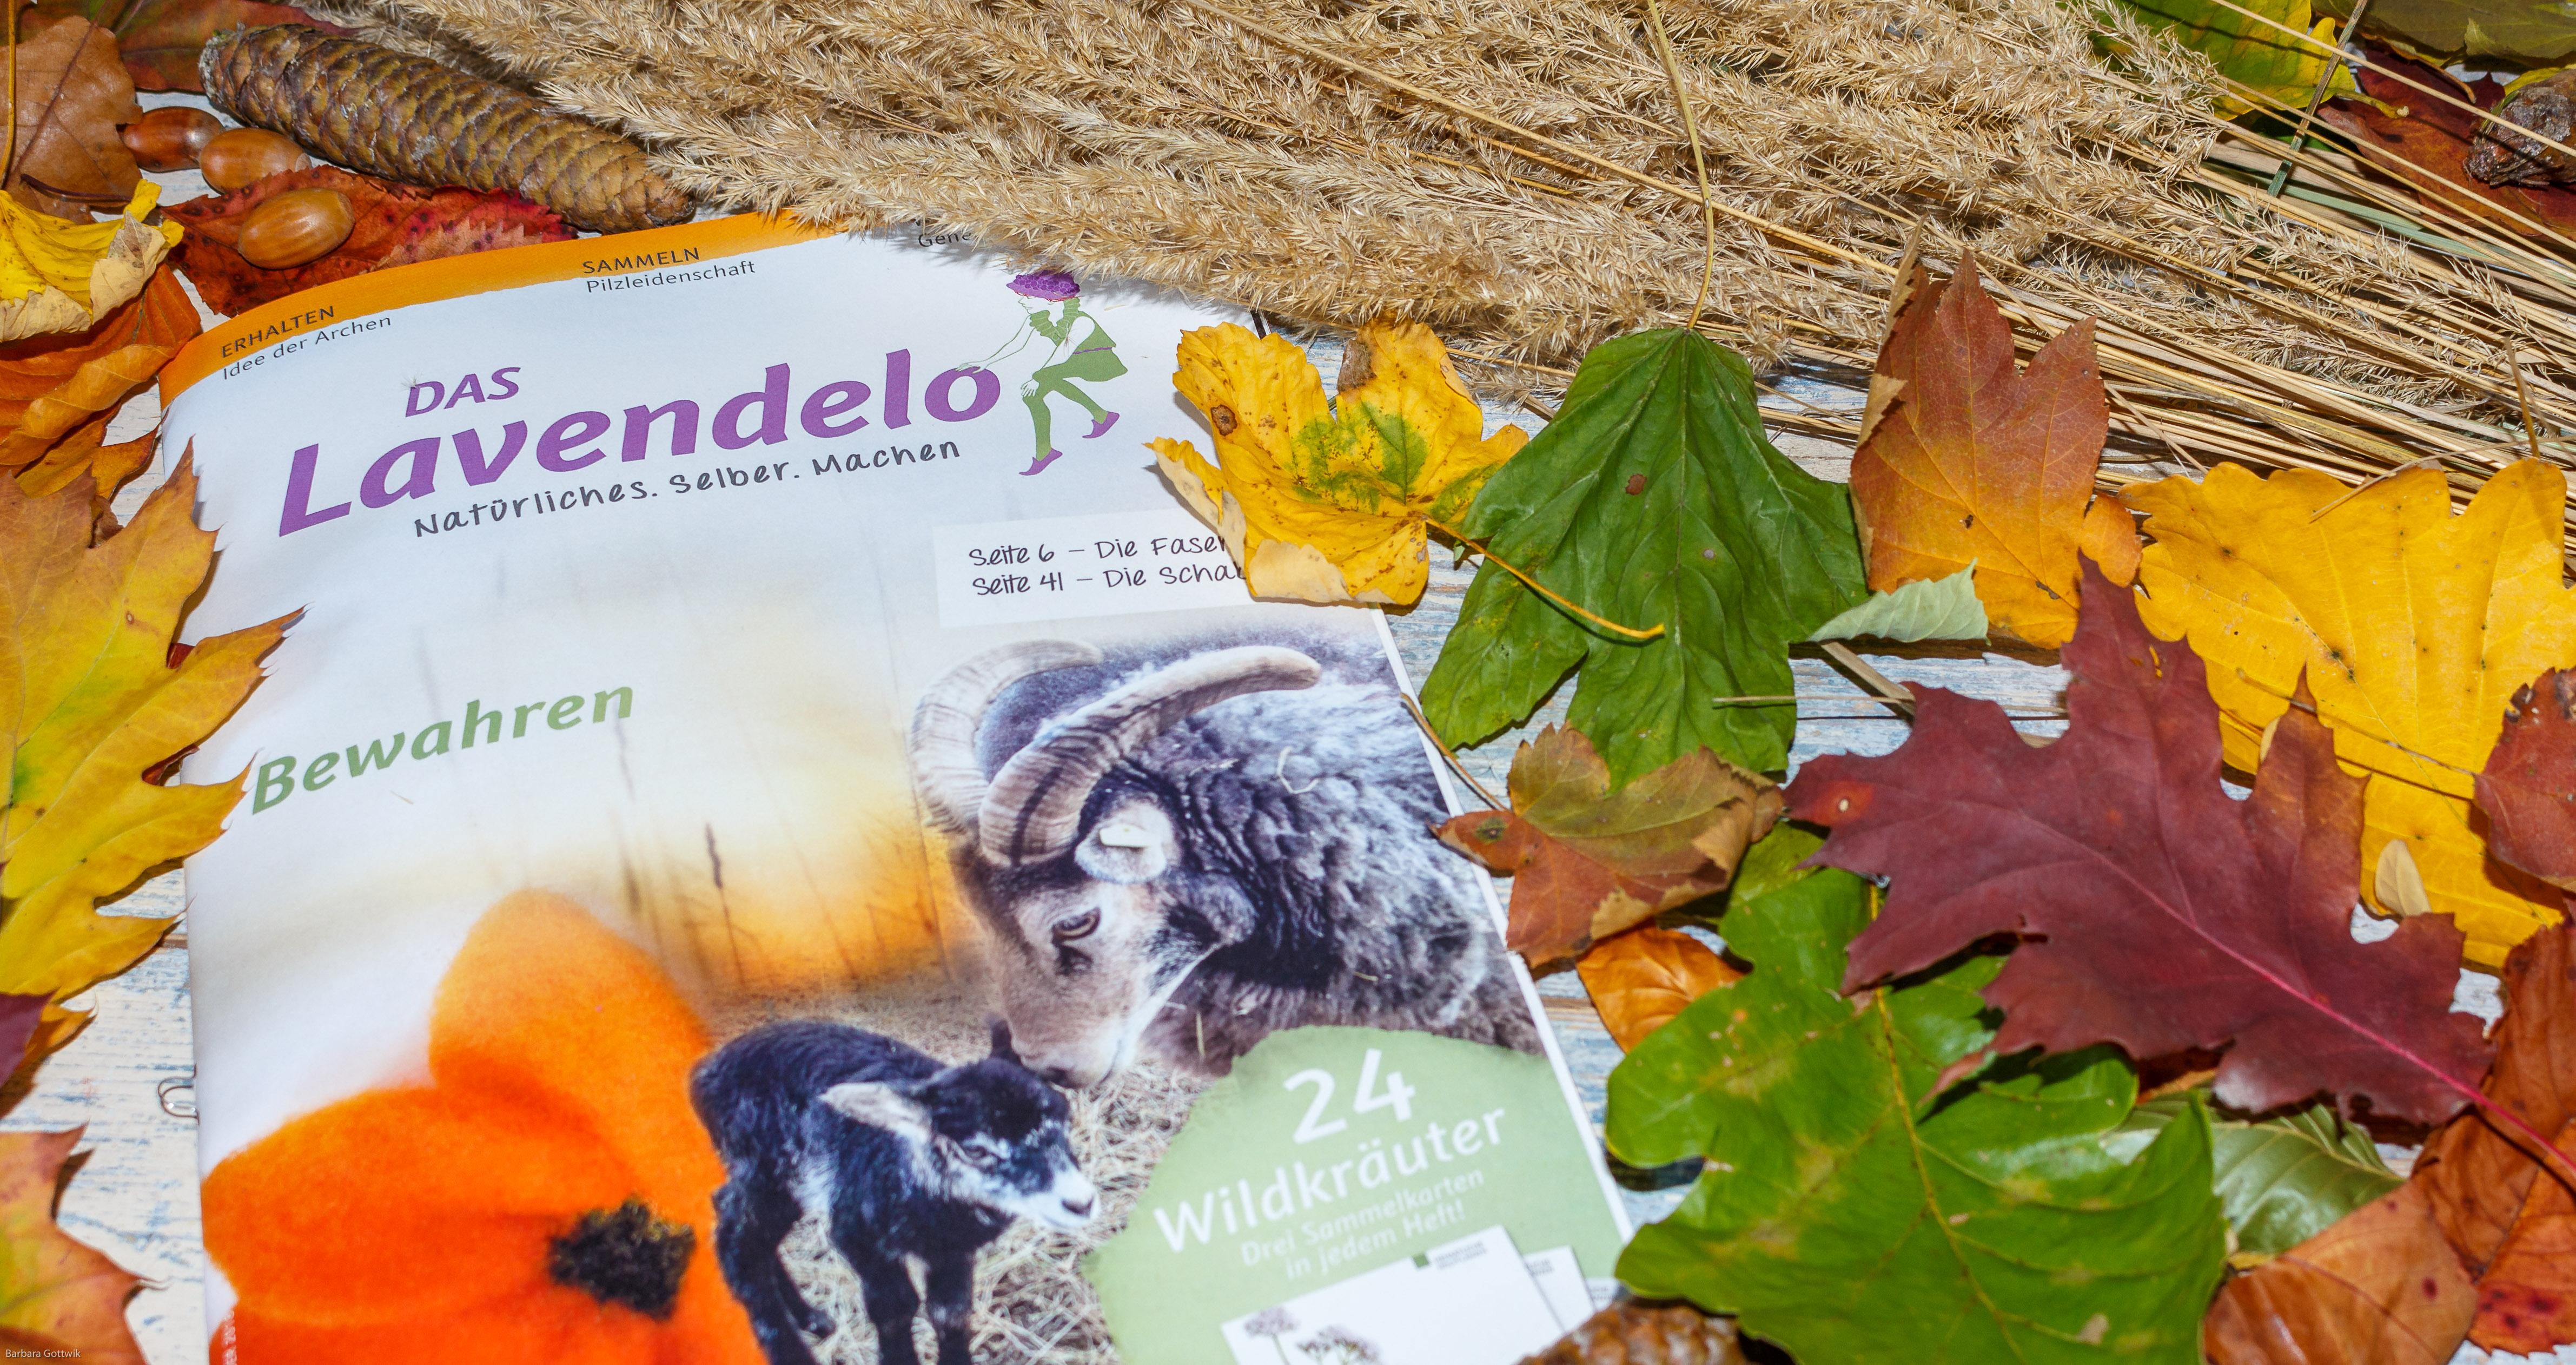 Das Lavendelo Ausgabe 8